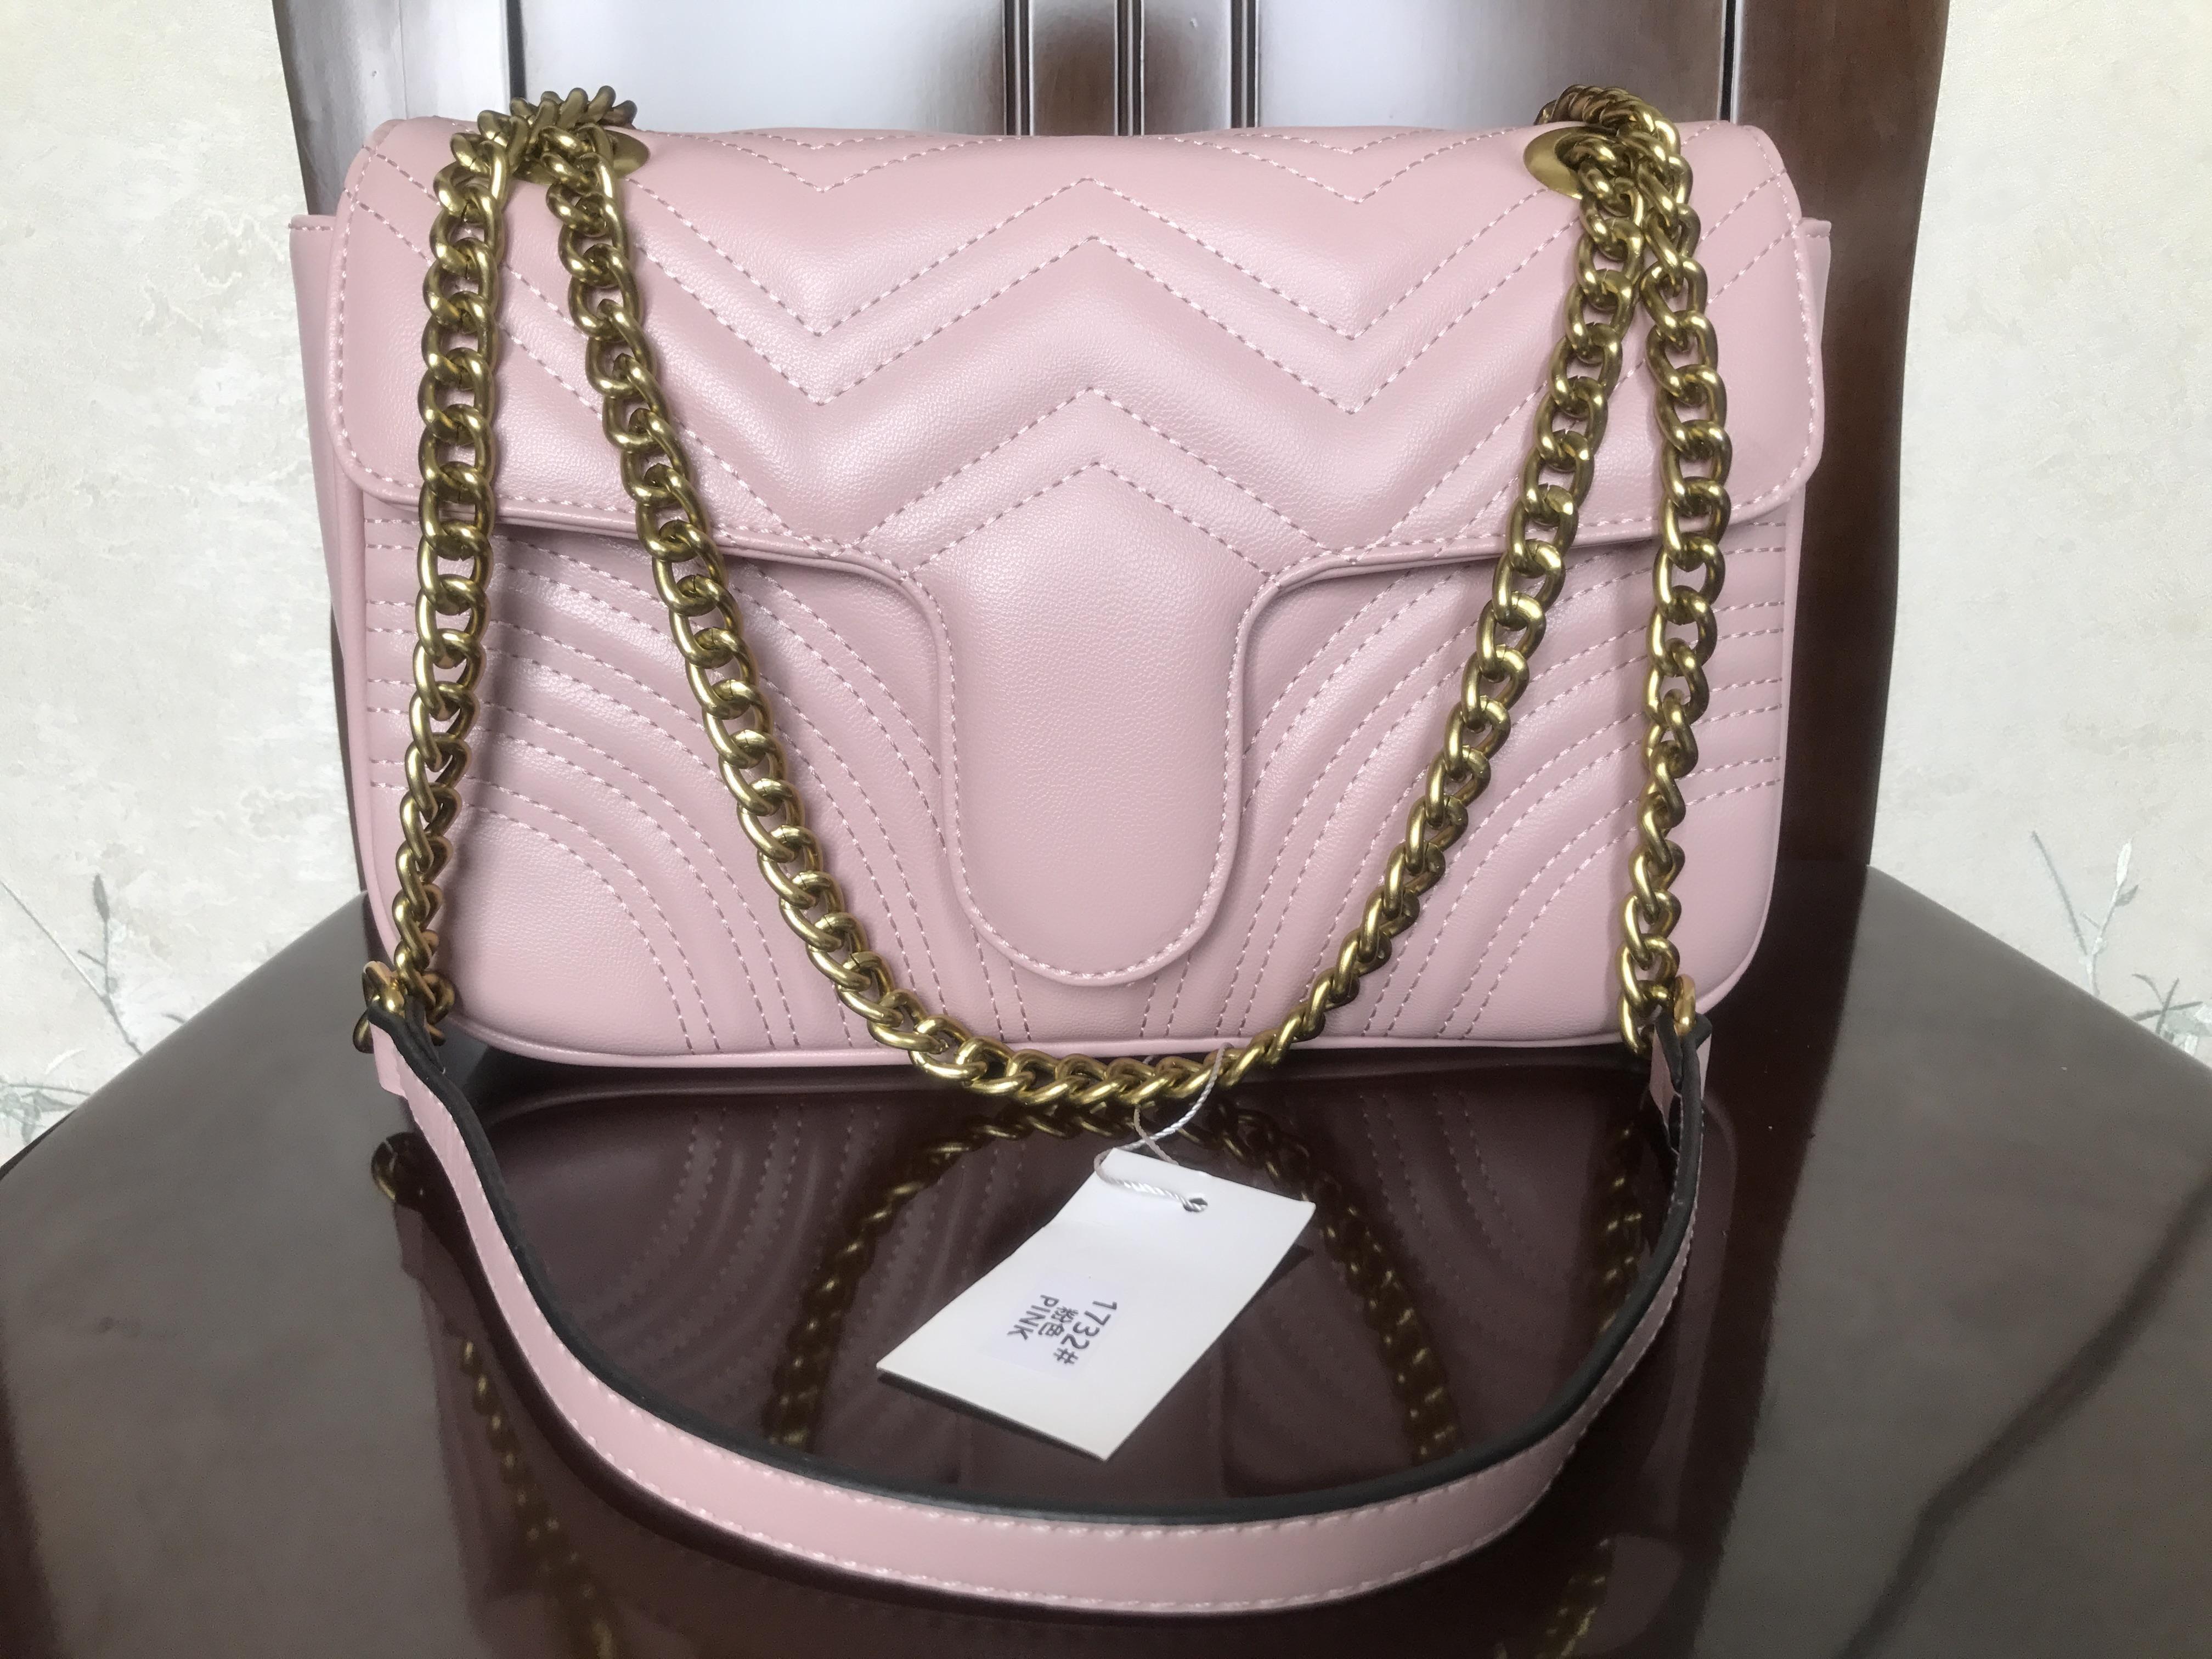 Quality 5colors Famous brand women designer Shoulder bag leather chain bag Cross body Pure color womens handbag crossbody bag purse